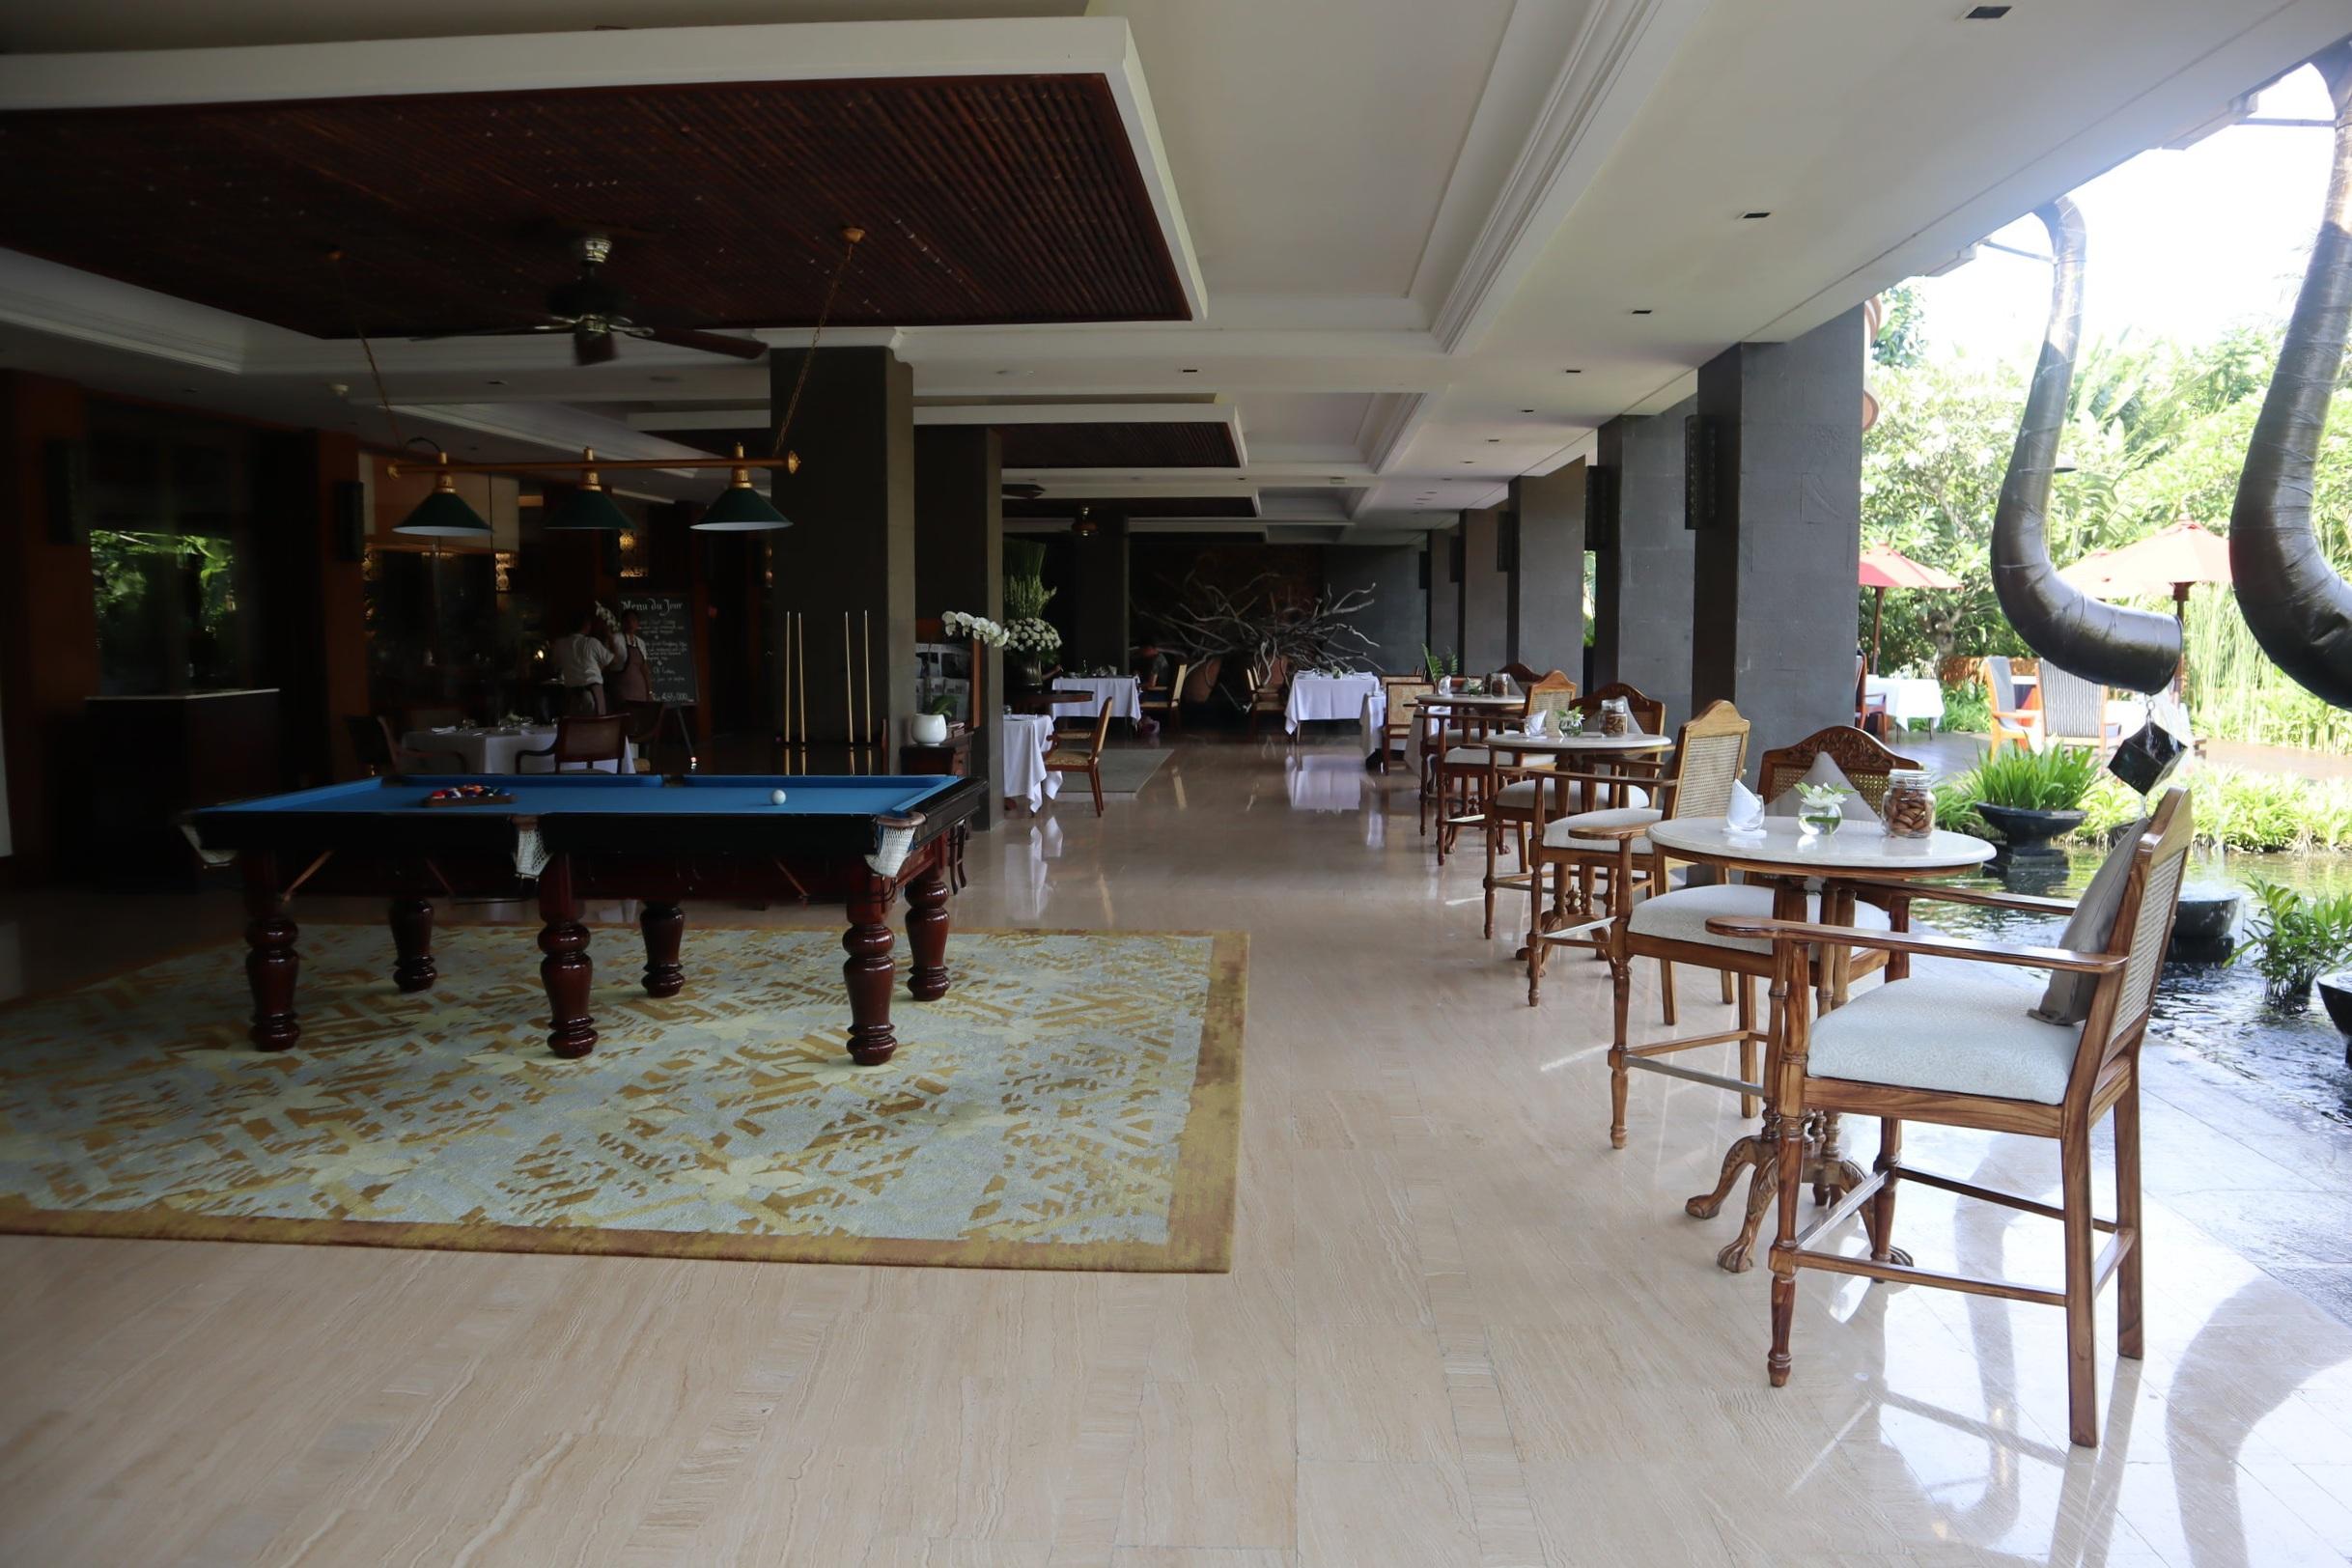 St. Regis Bali – Gourmet Deli restaurant